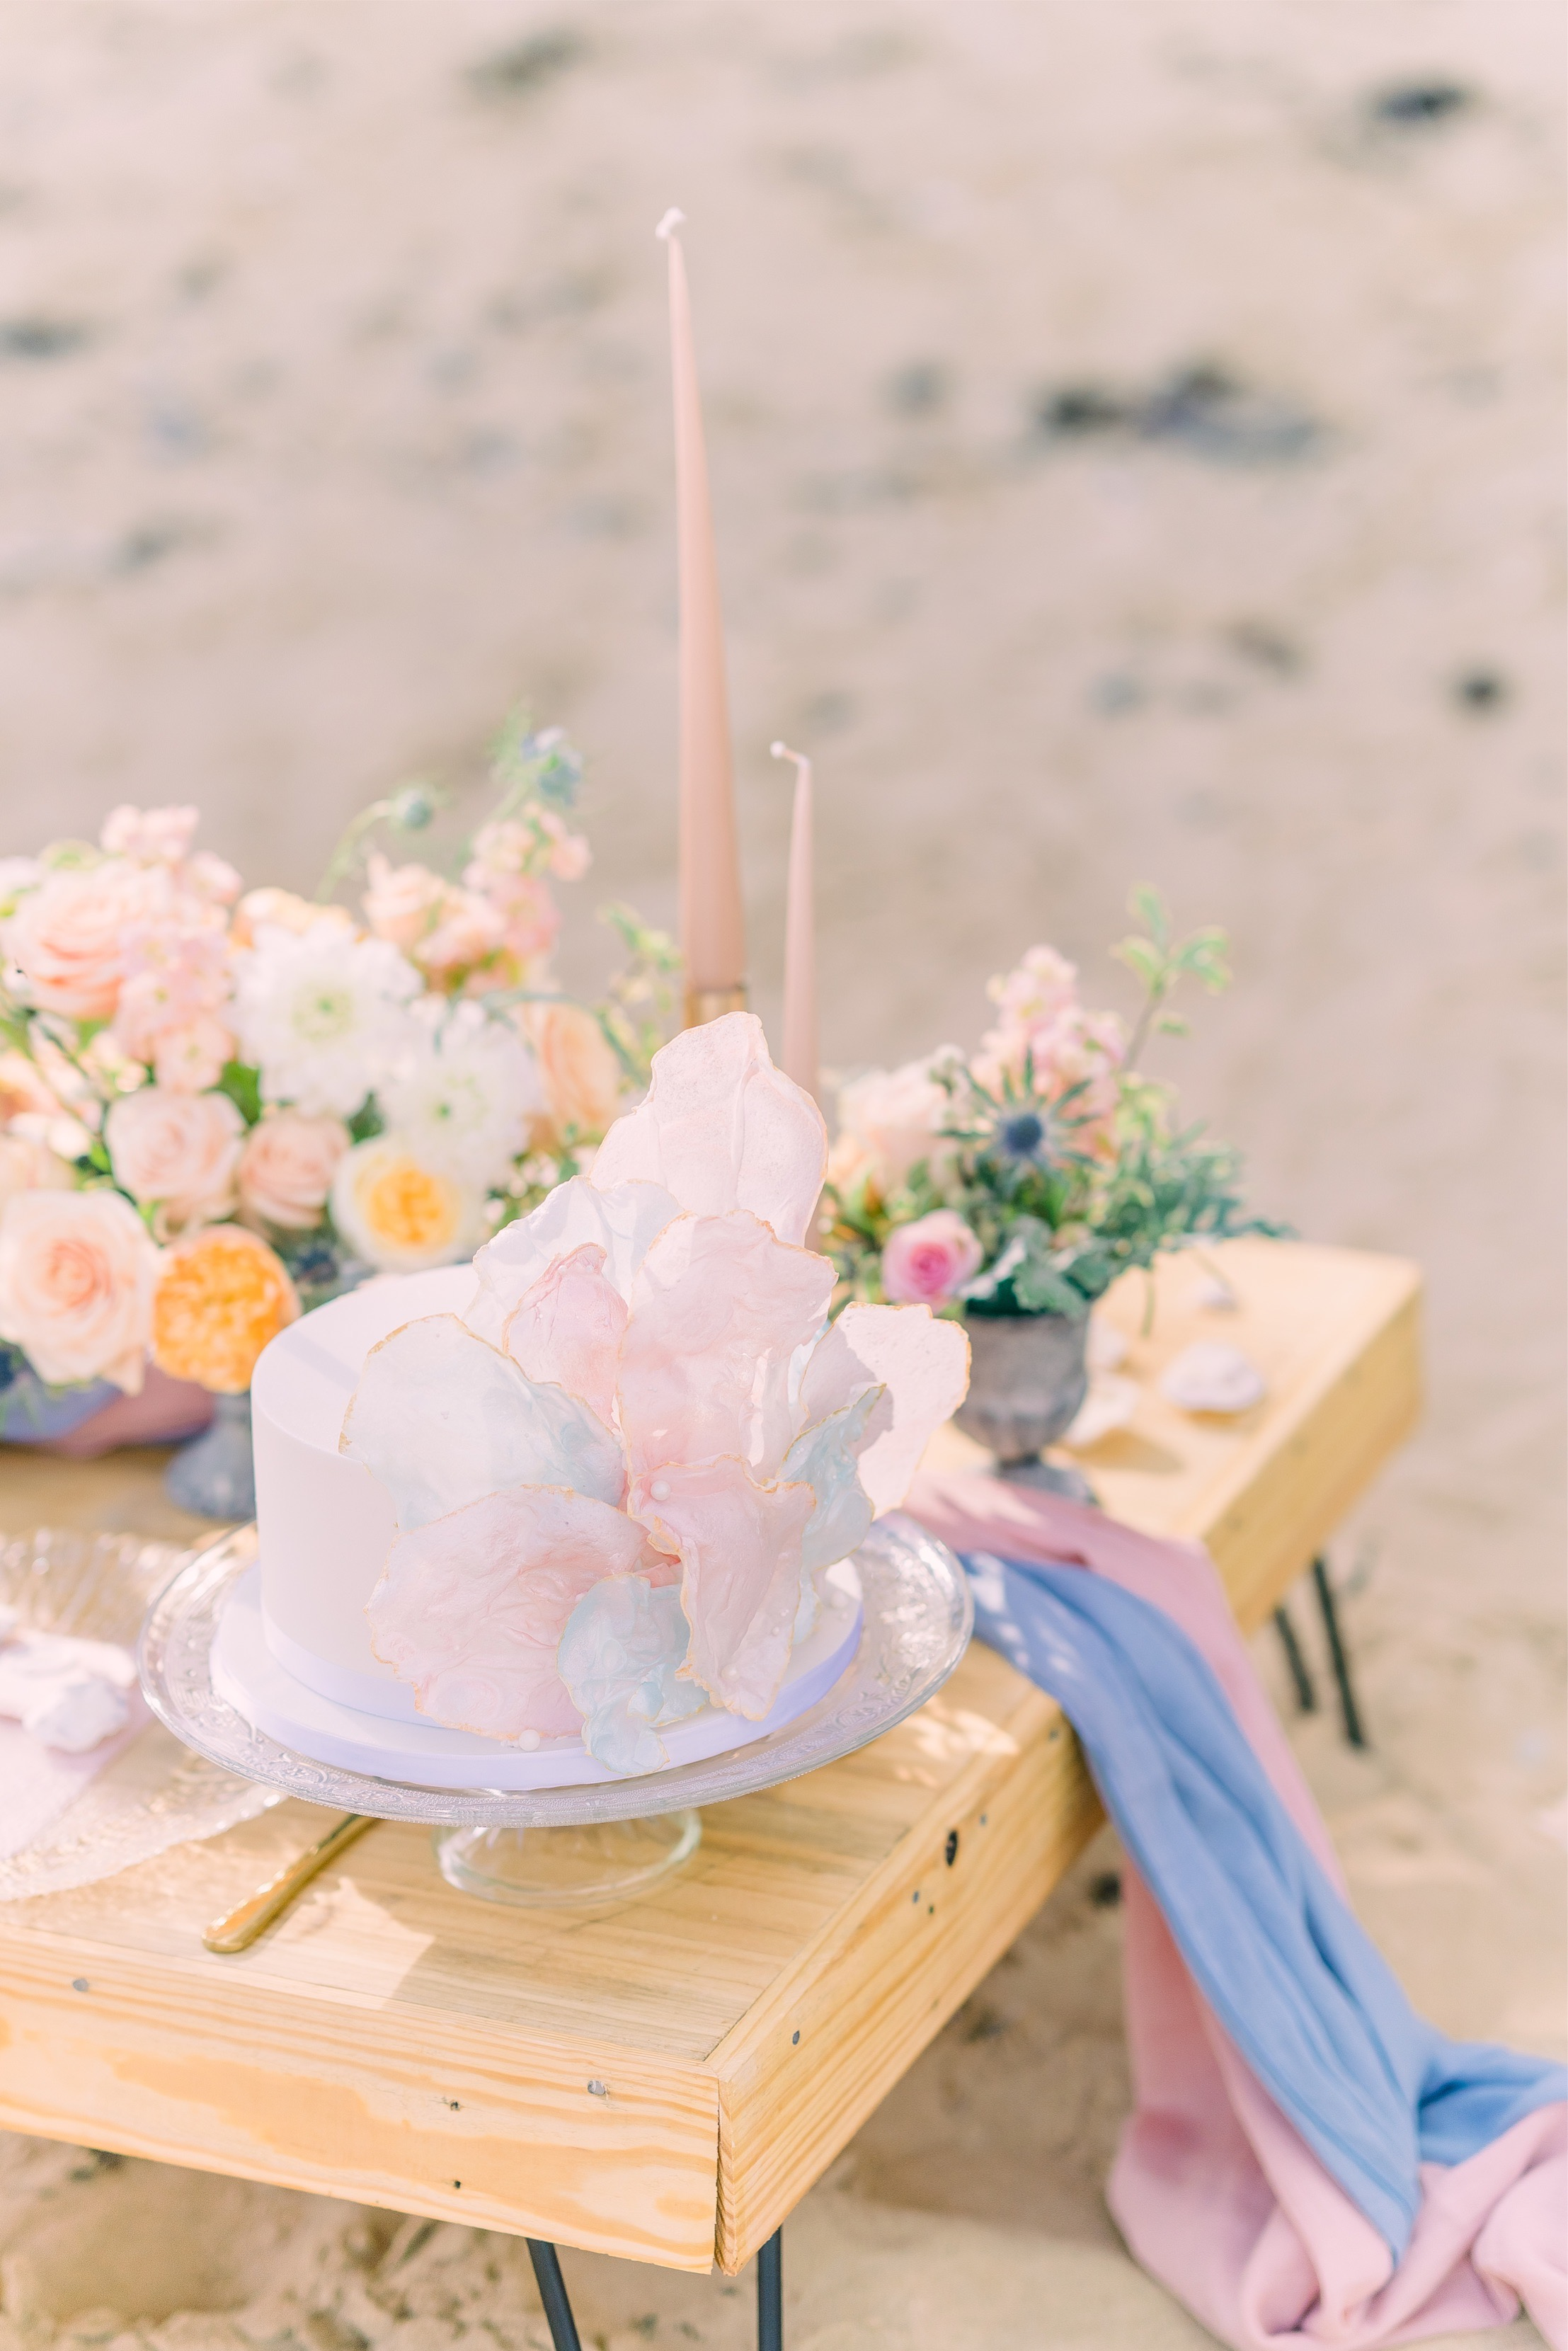 Mersea Island Elopement Wedding by Ioana